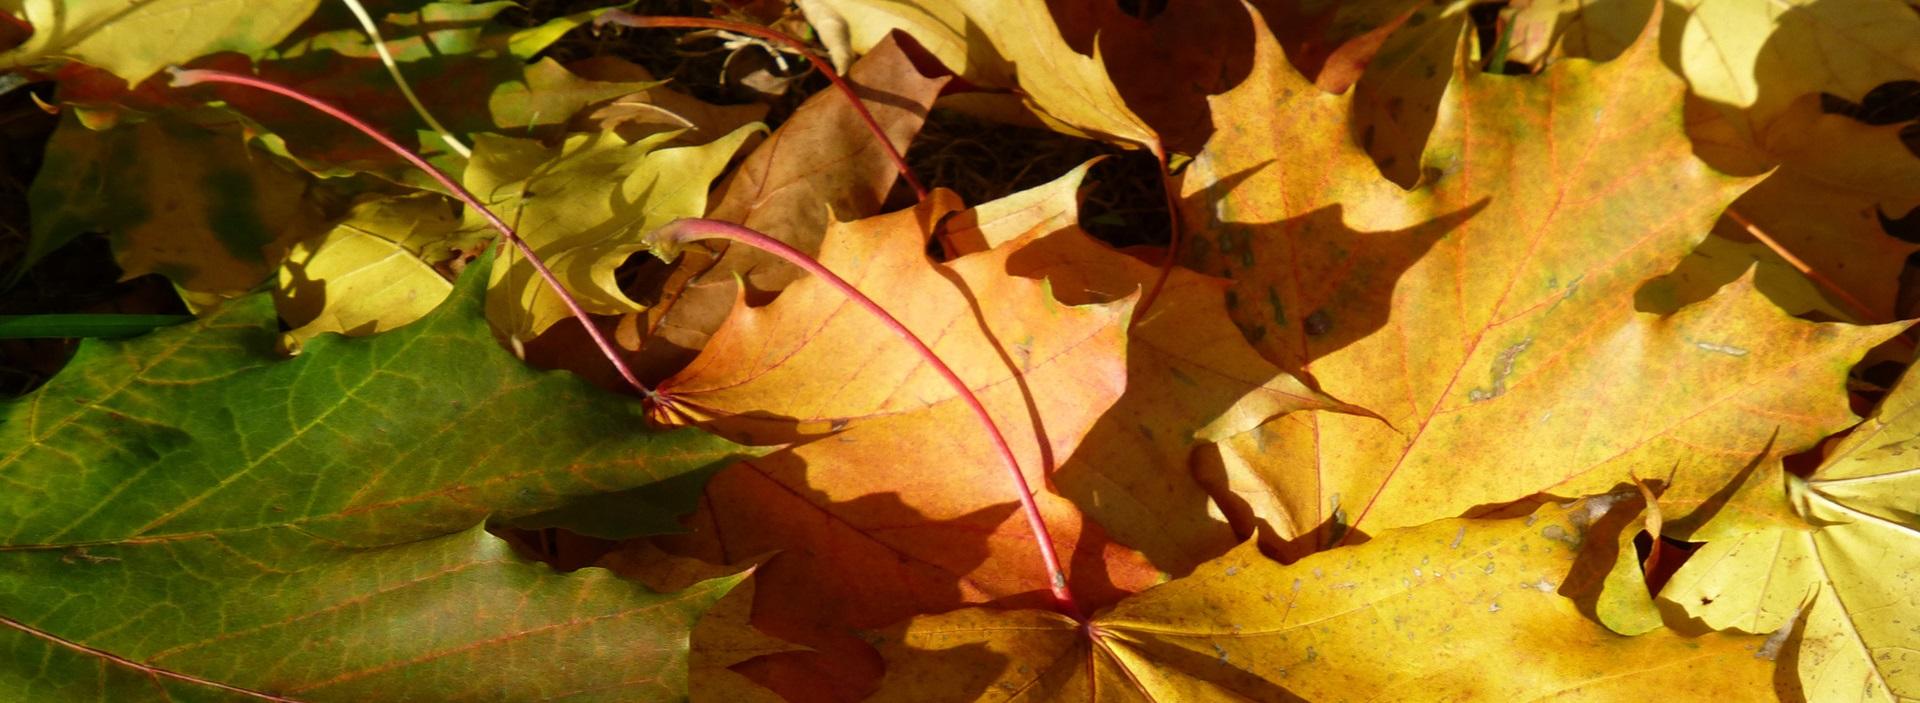 Leaf Blower Permit - City of Cambridge, MA